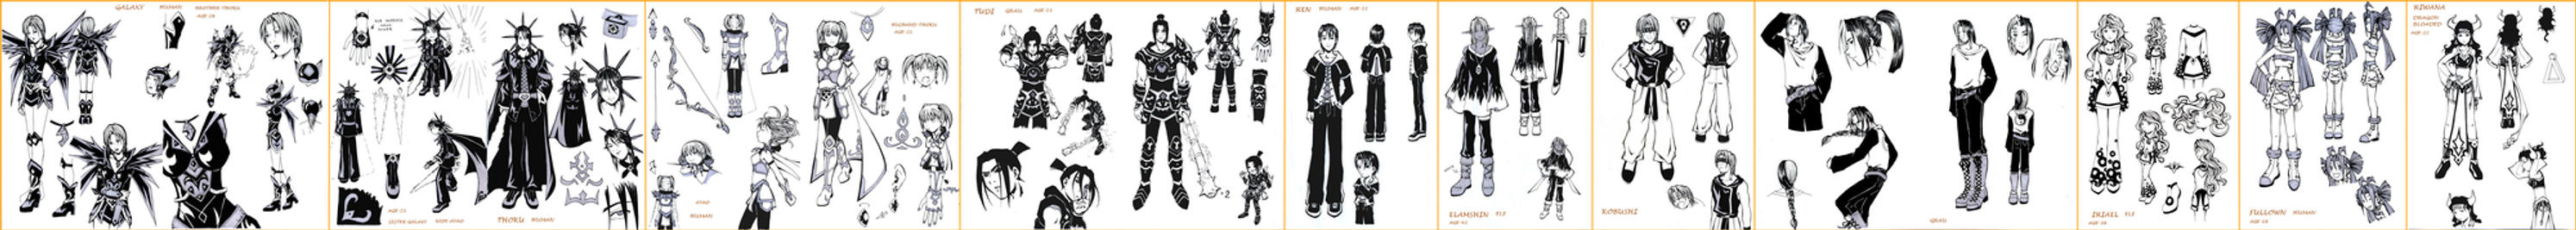 manga characters set2 by AgataKa19